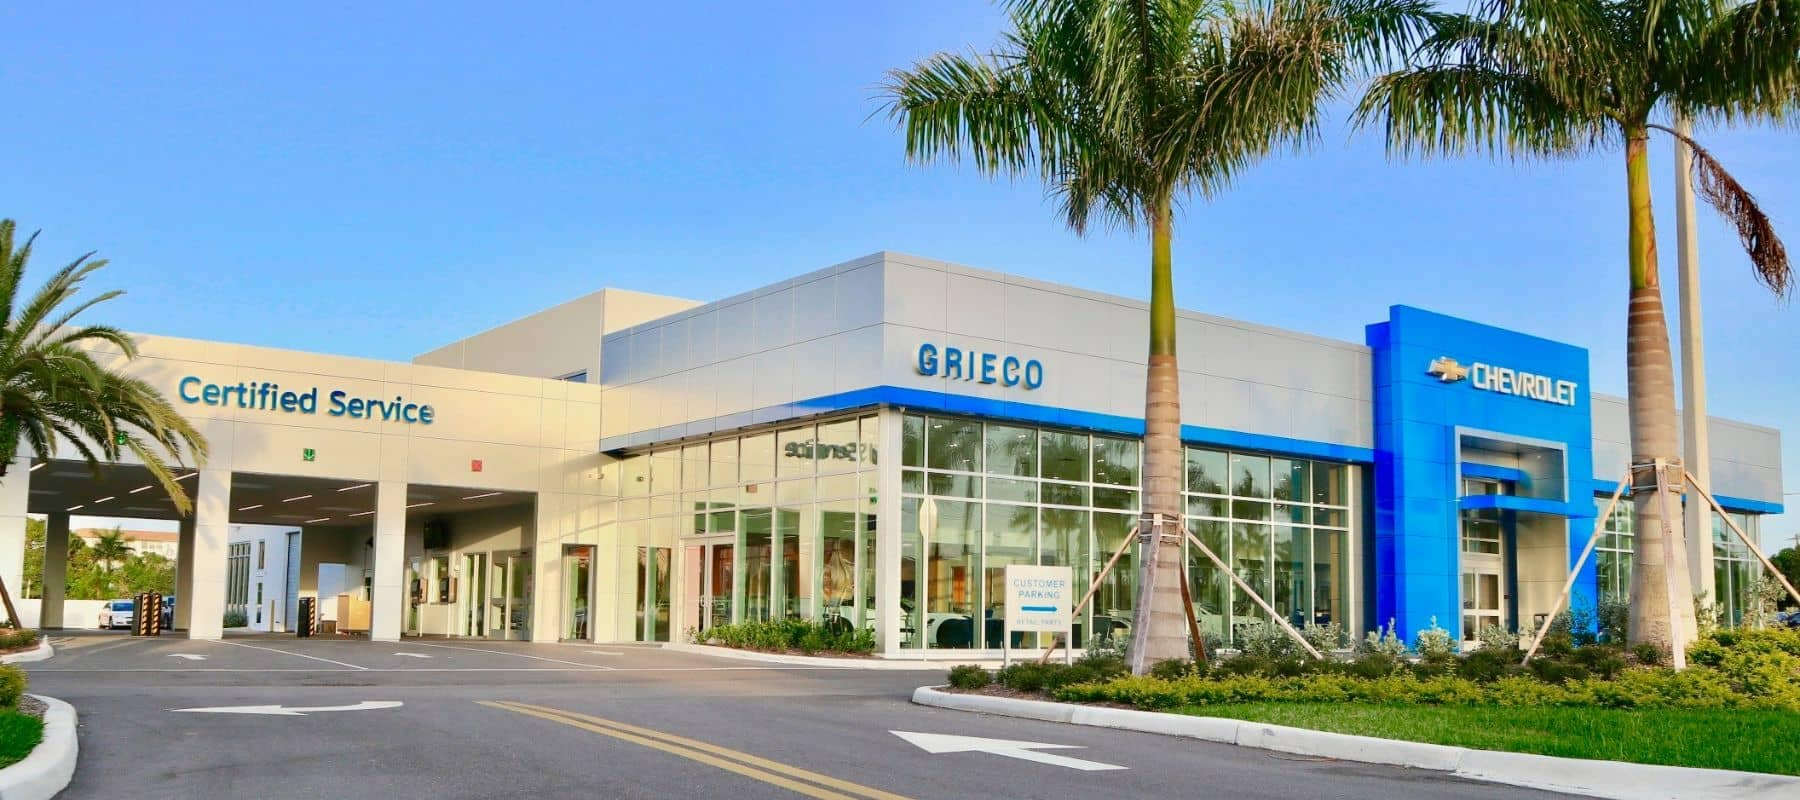 Greico Chevrolet front of dealership